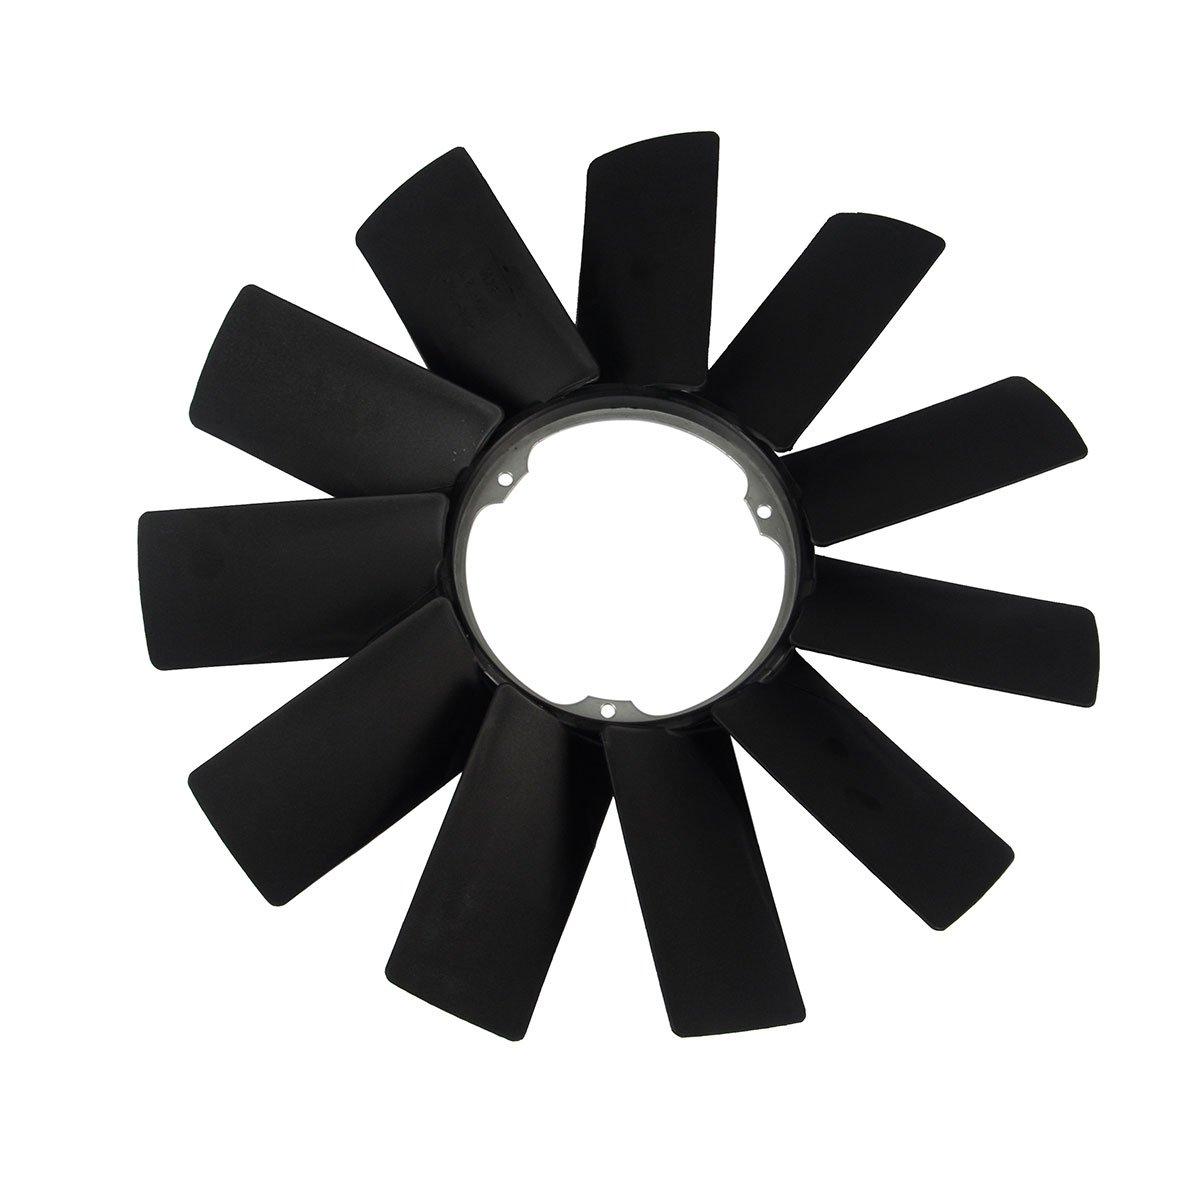 A-Premium Engine Radiator Cooling Fan Blade for BMW E31 E32 E34 E38 E39 530i 540i 840Ci 850Ci 740i 750i iL 11521712110